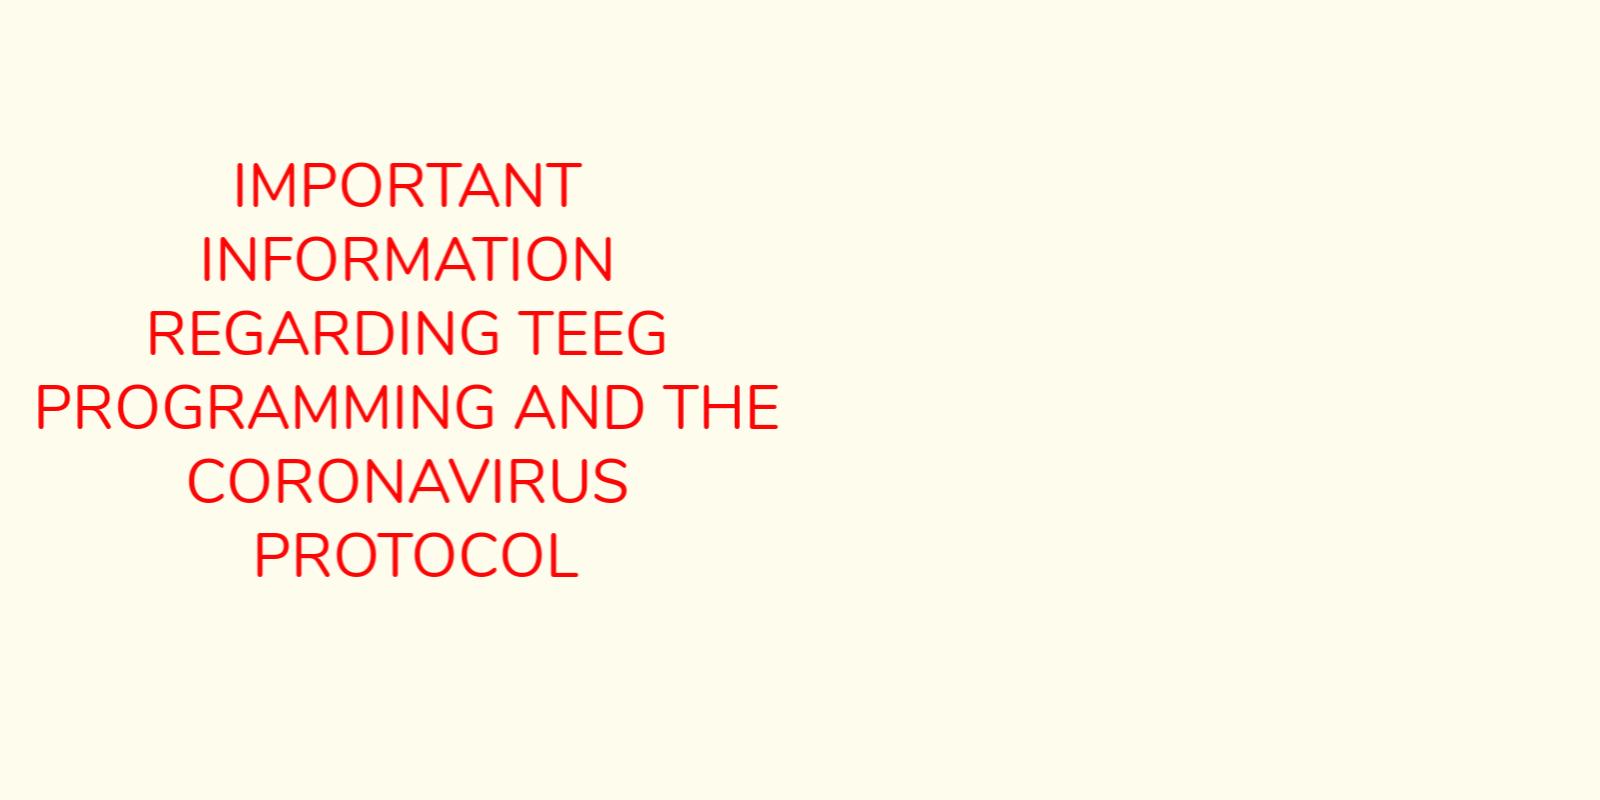 Corona Virus Protocol